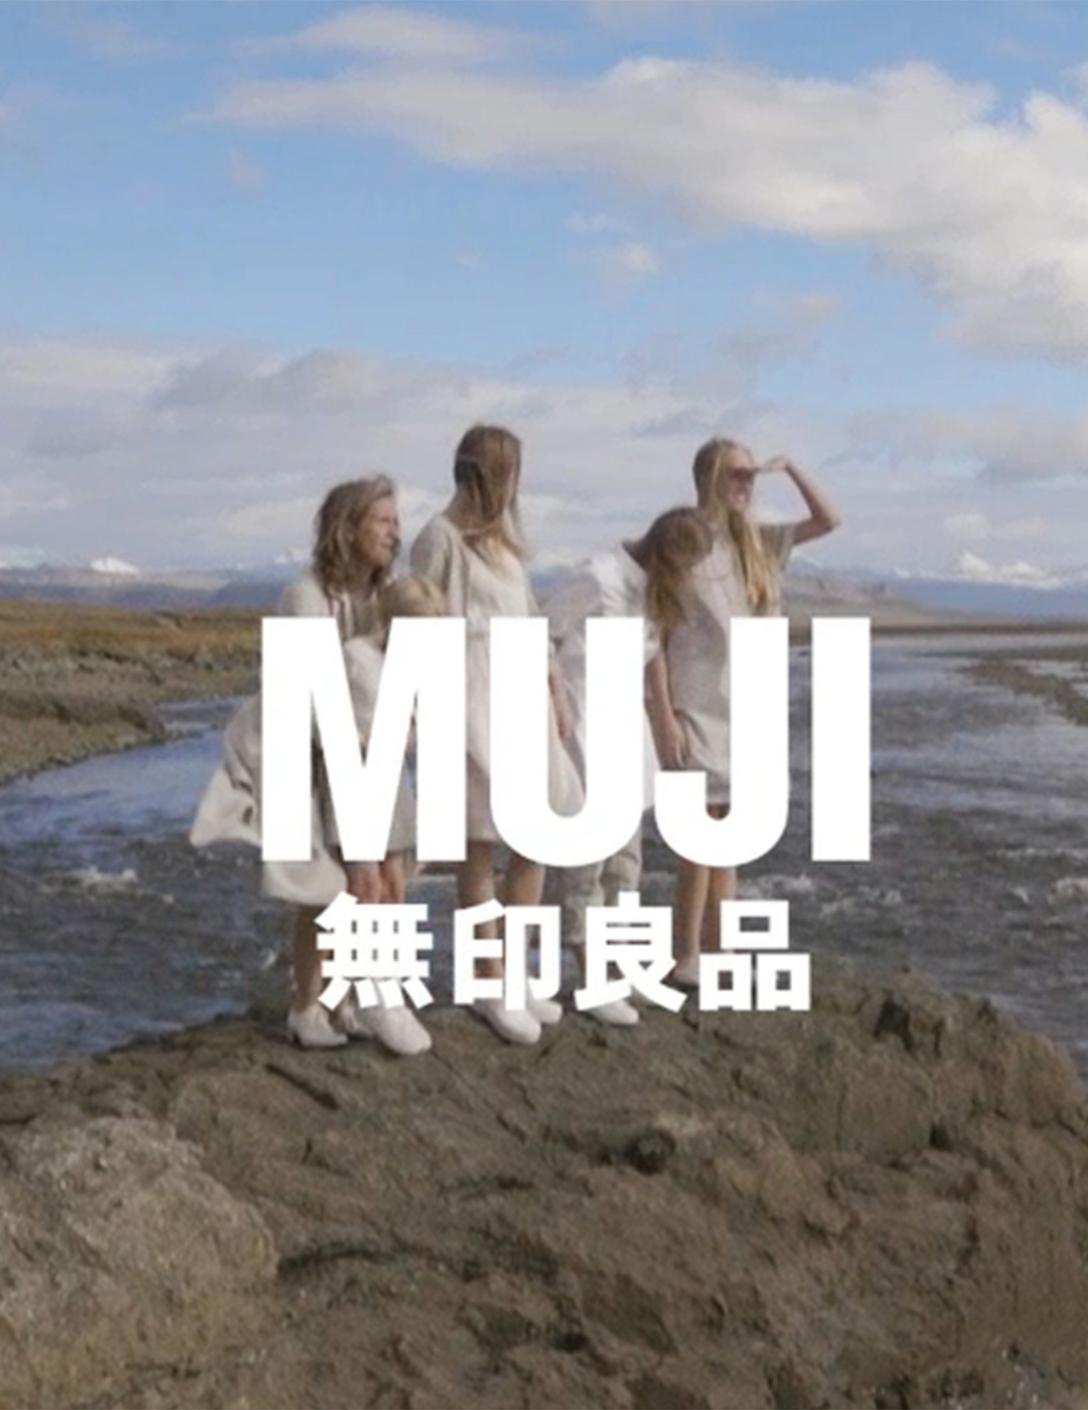 Nature, Natural, Muji